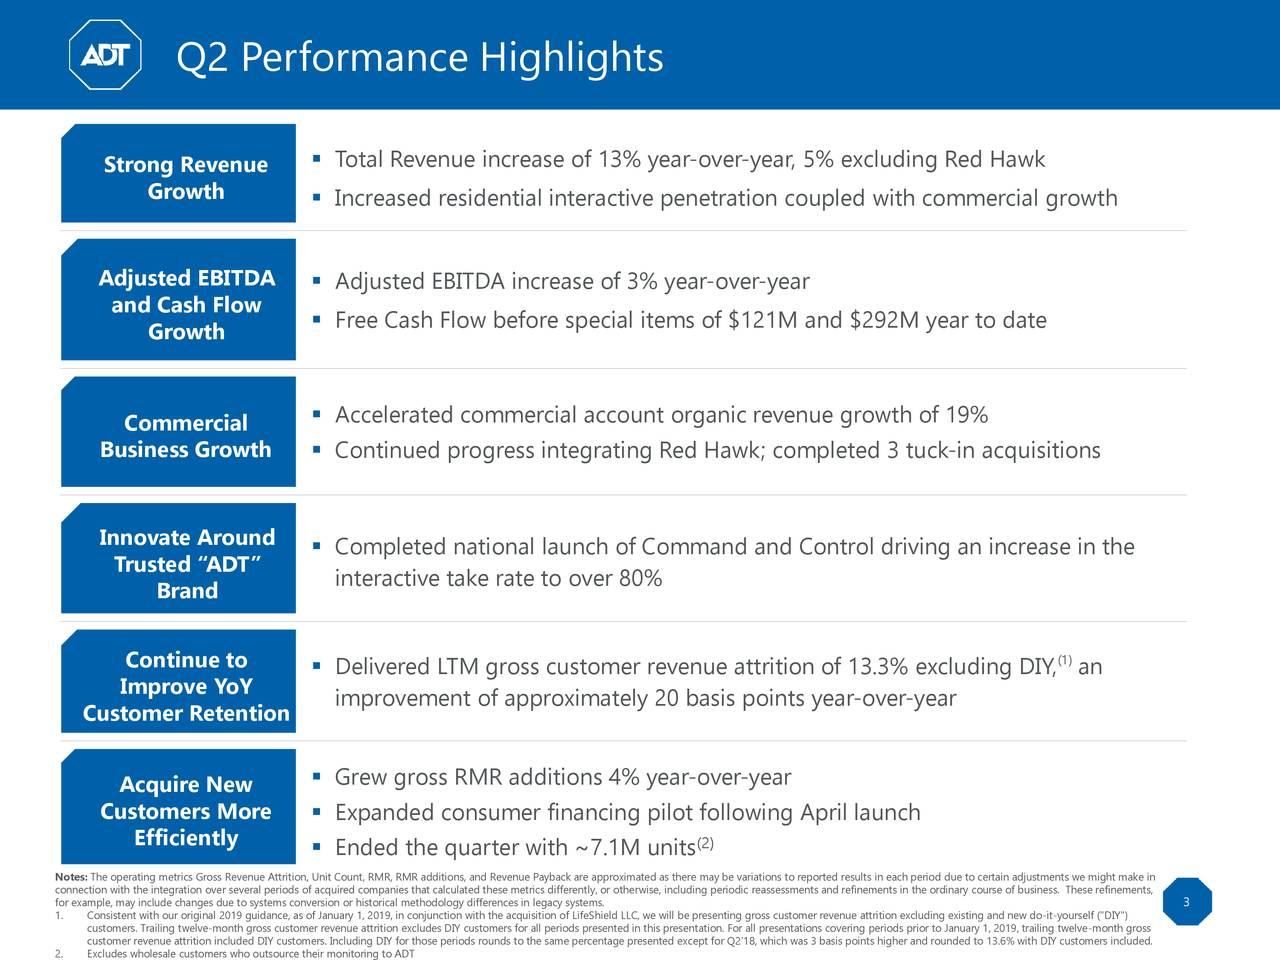 Q2 Performance Highlights